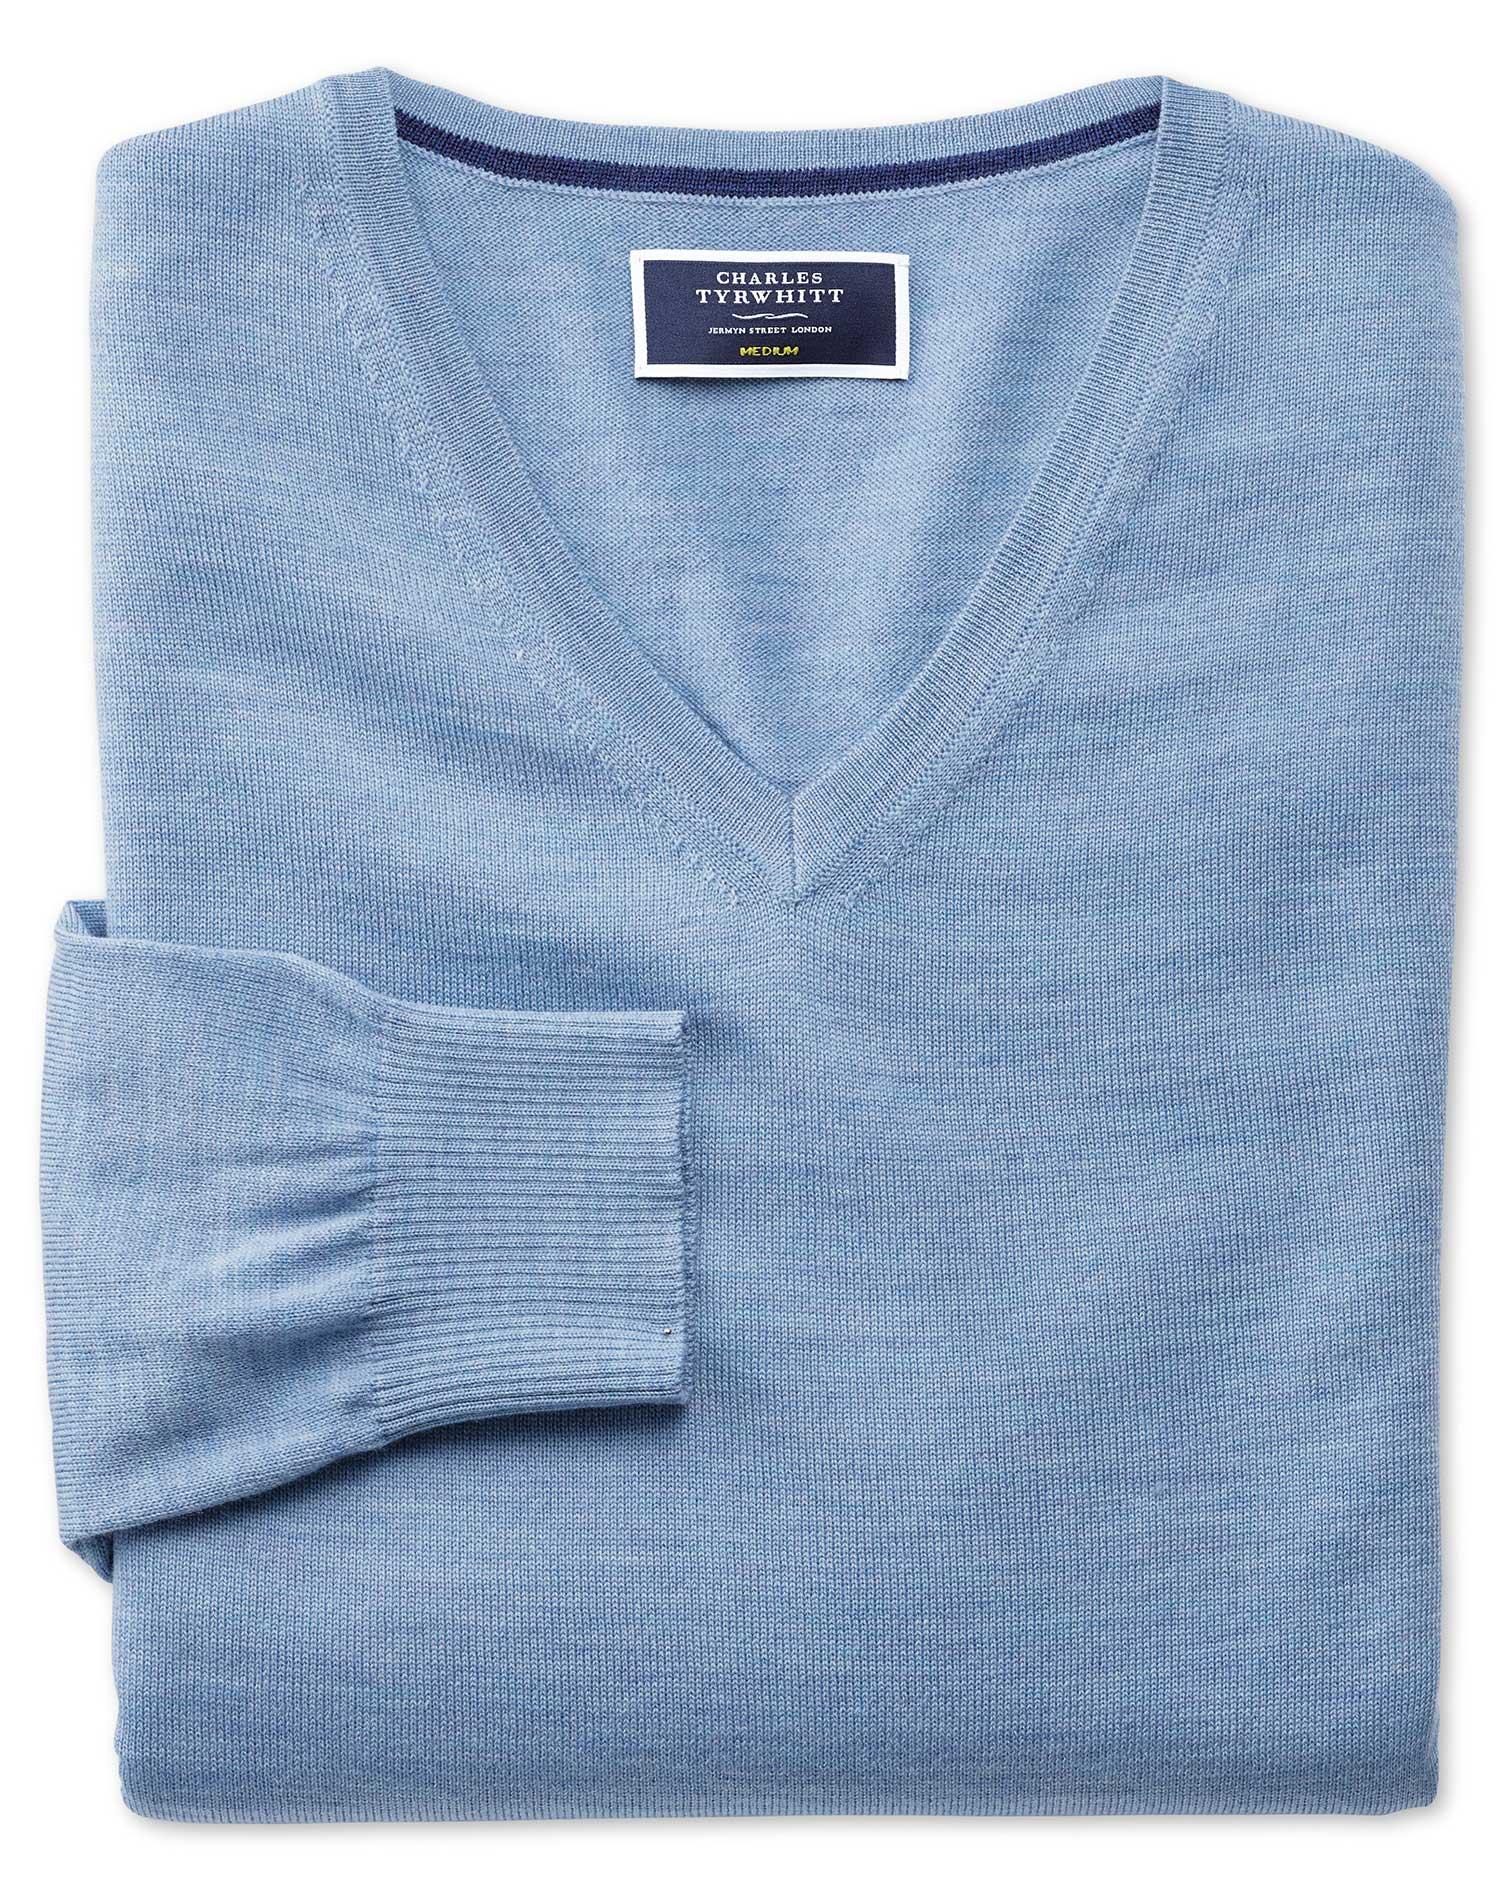 Sky Merino Wool V-Neck Jumper Size Medium by Charles Tyrwhitt